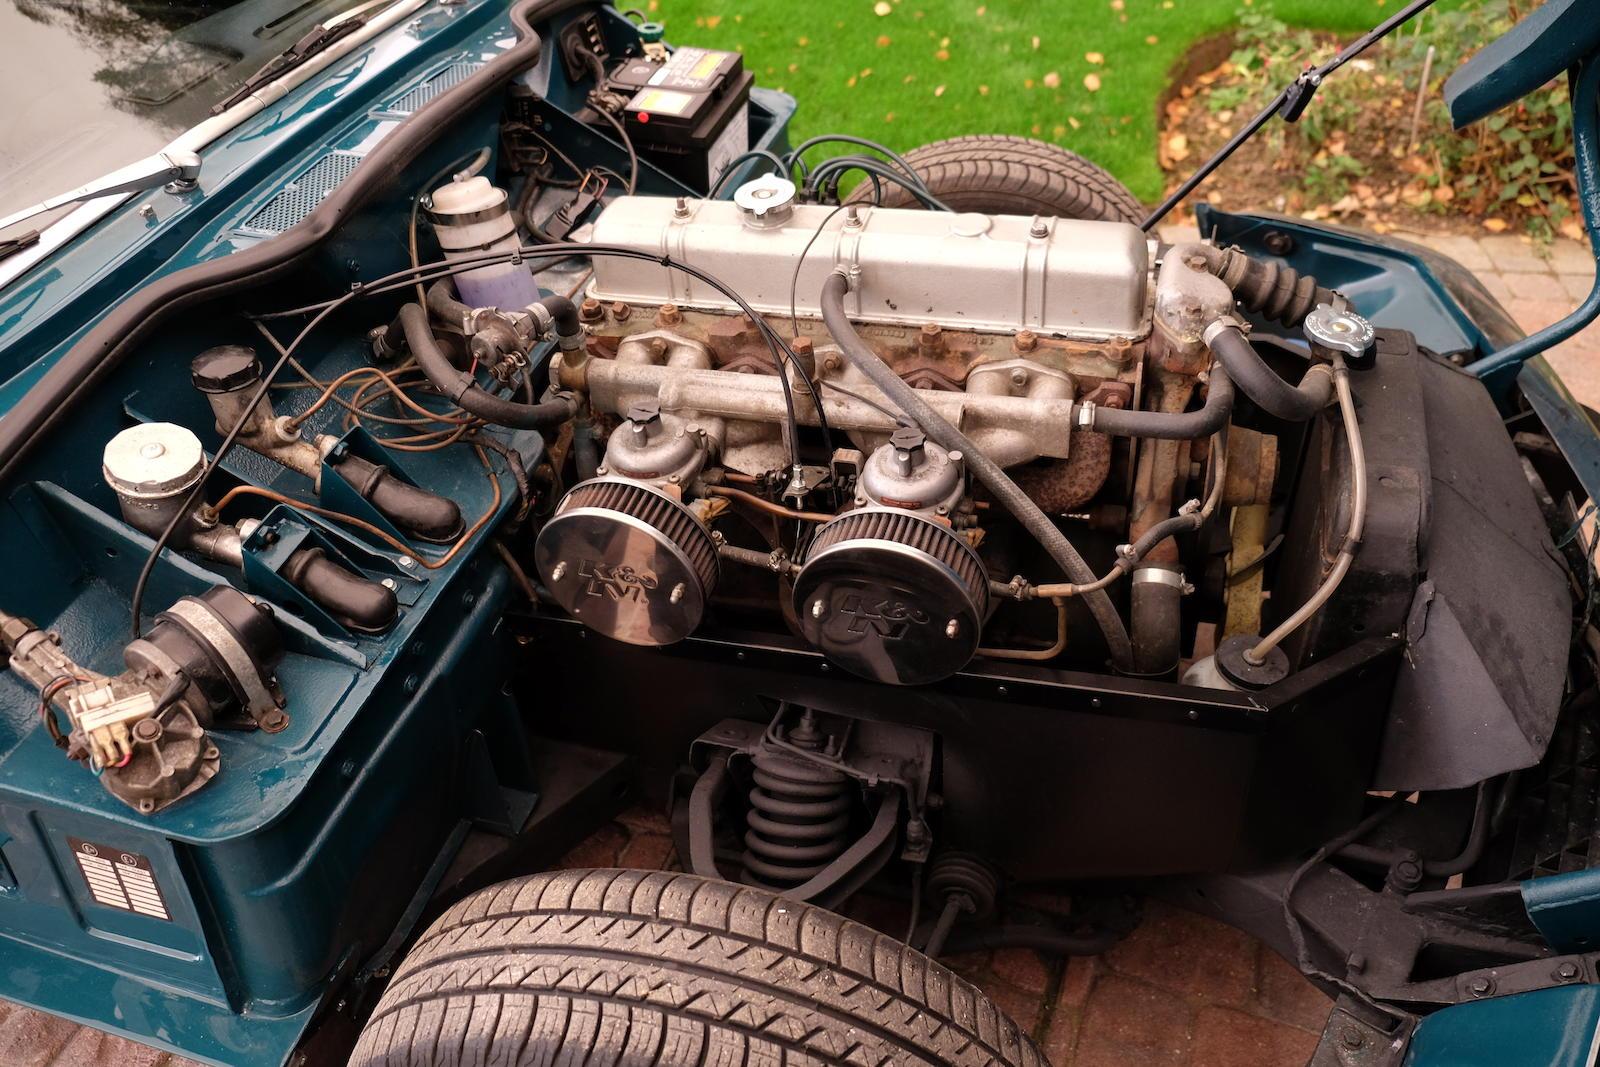 1972 Triumph GT6 Mk III Coupé engine